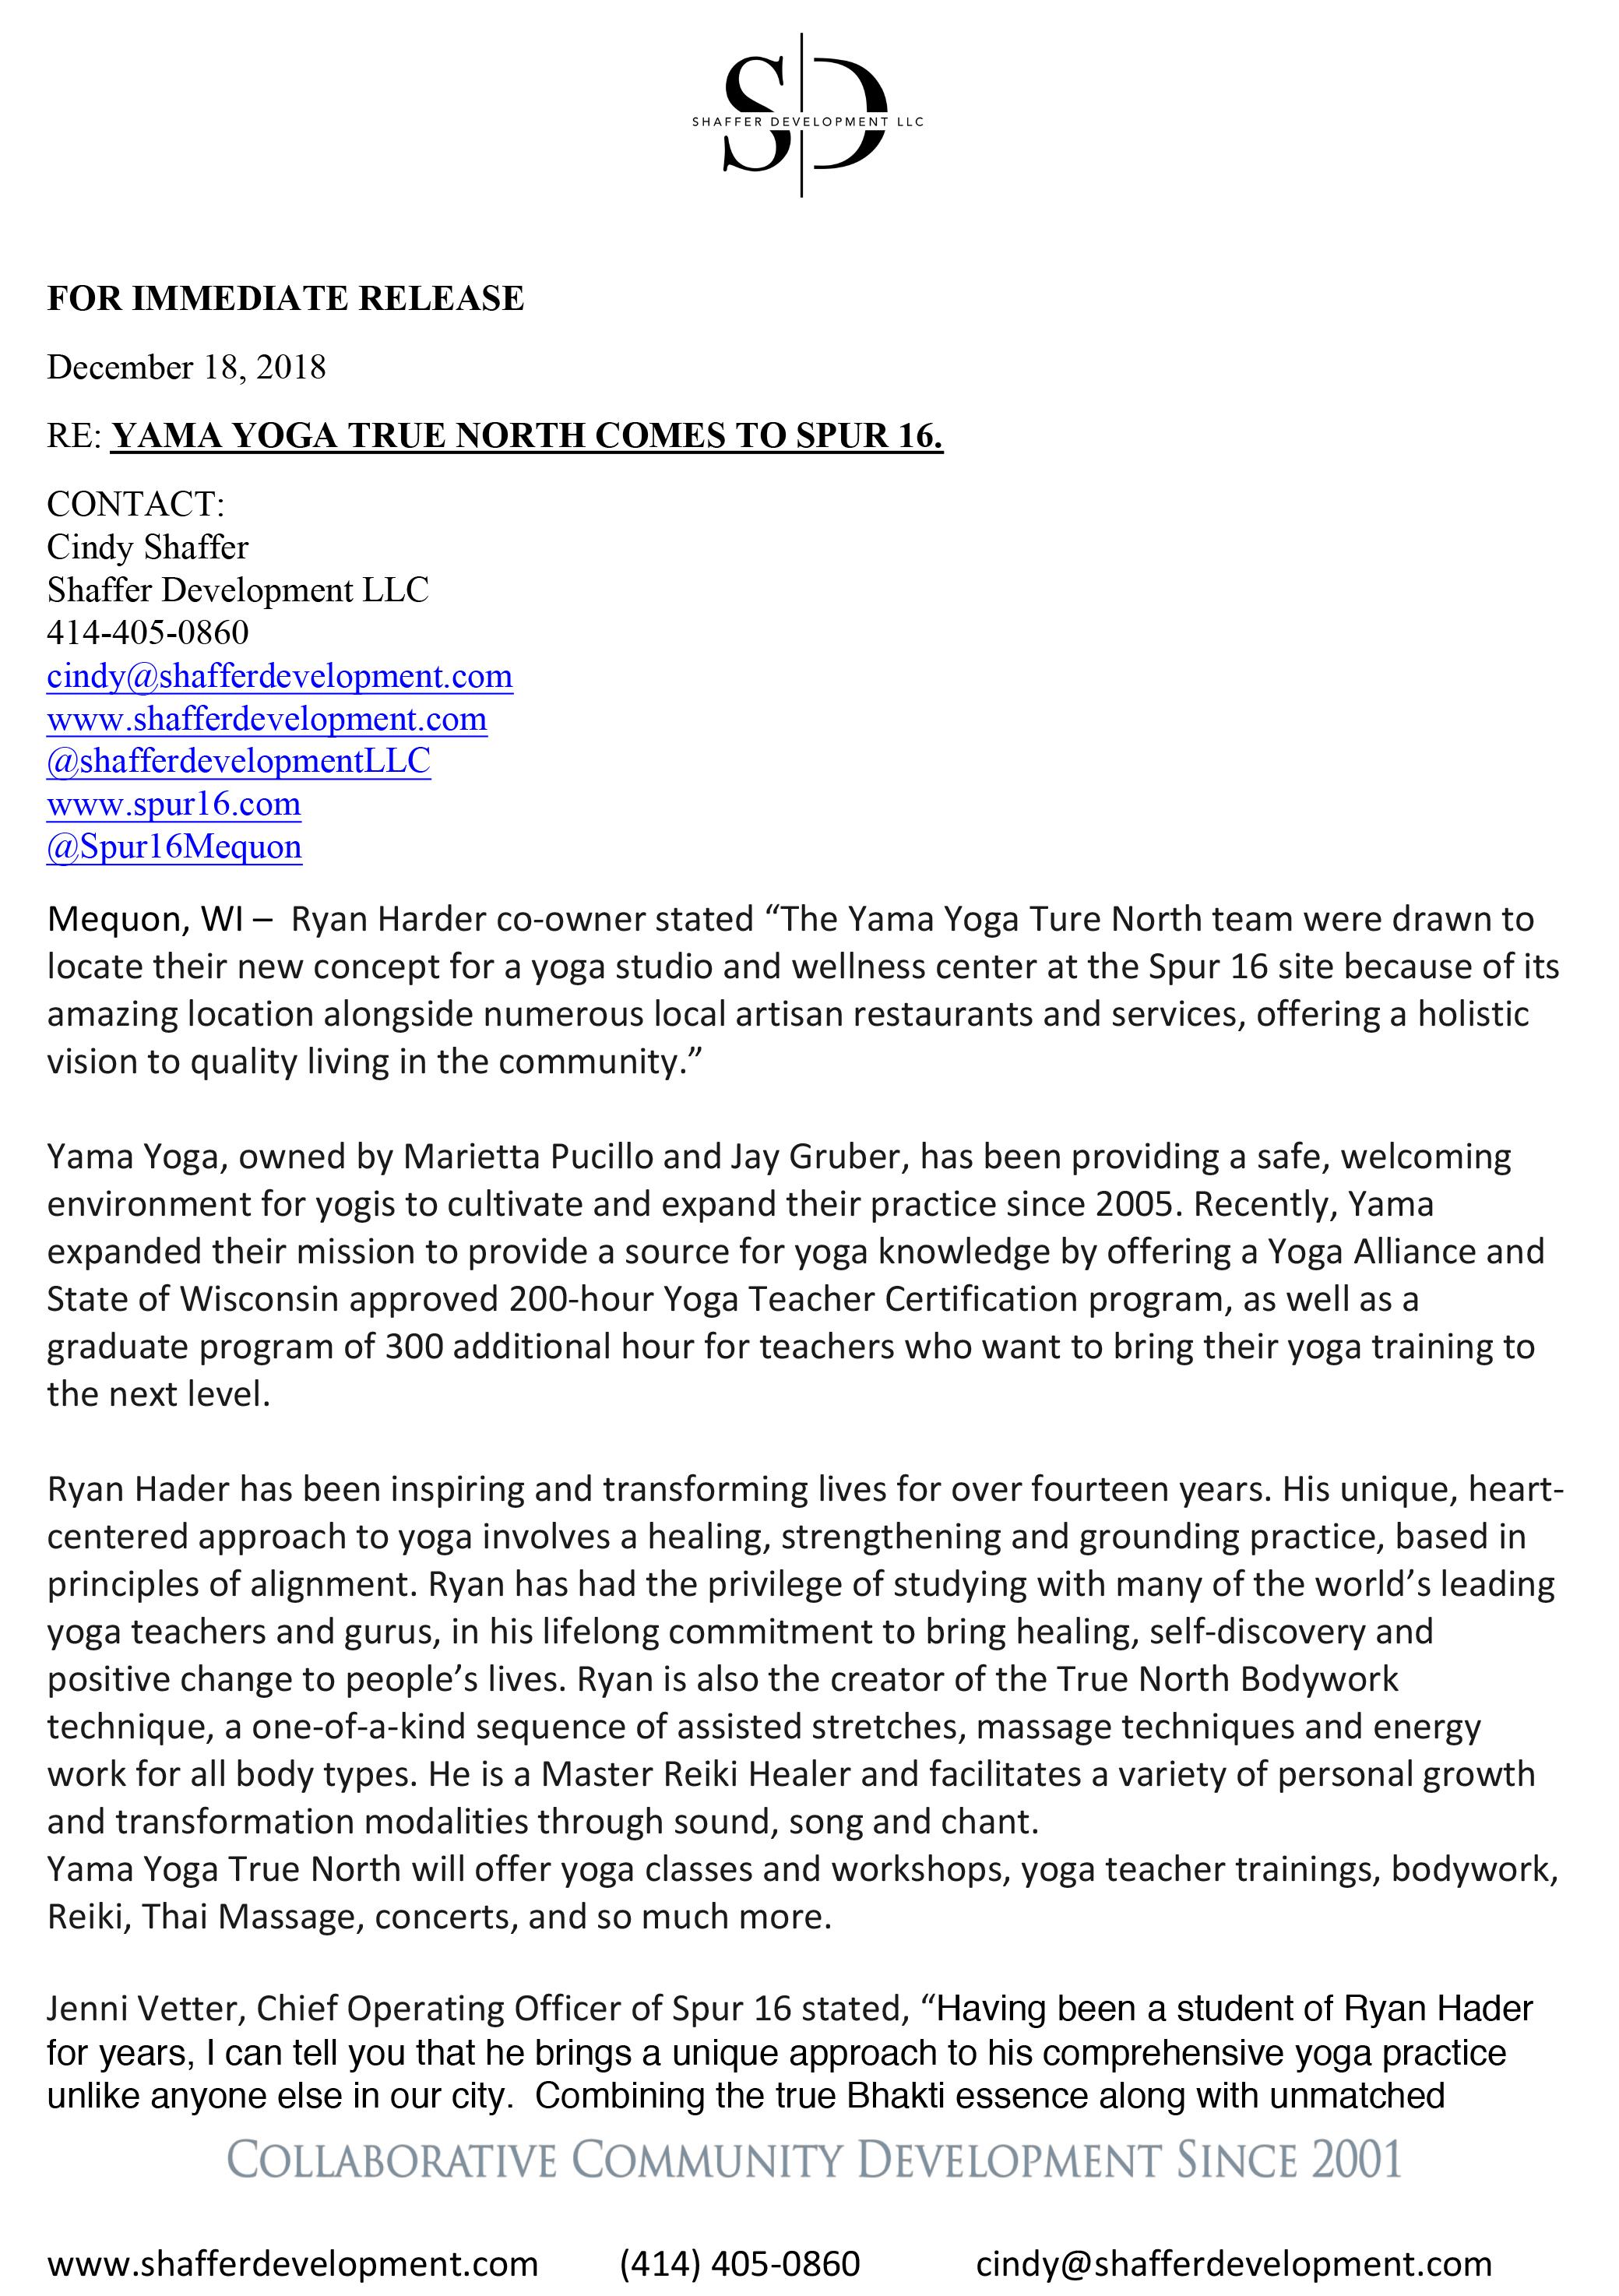 Yama Yoga True North Press Release 1.jpg